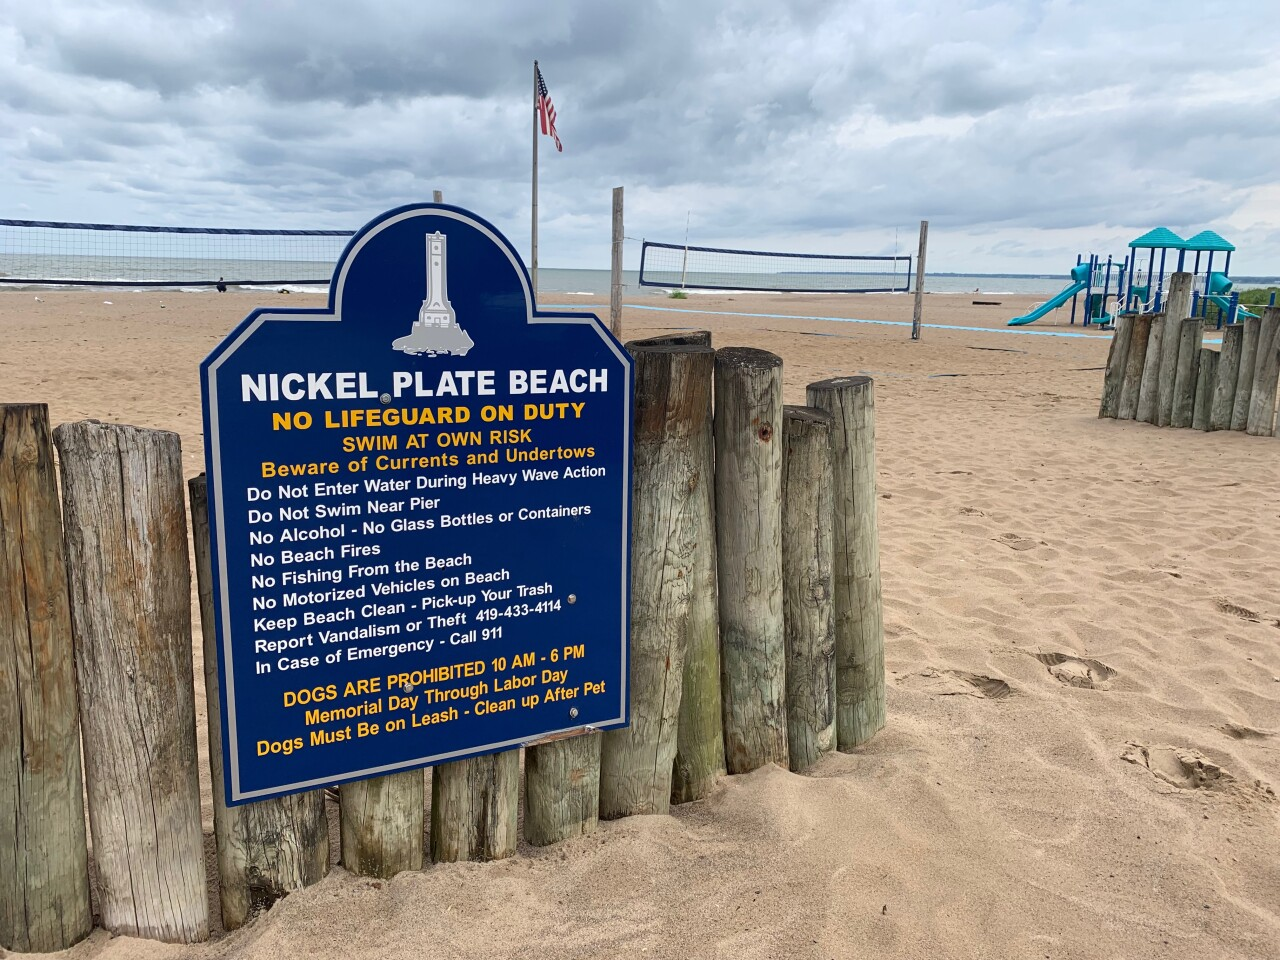 Nickel Plate Beach no lifeguard